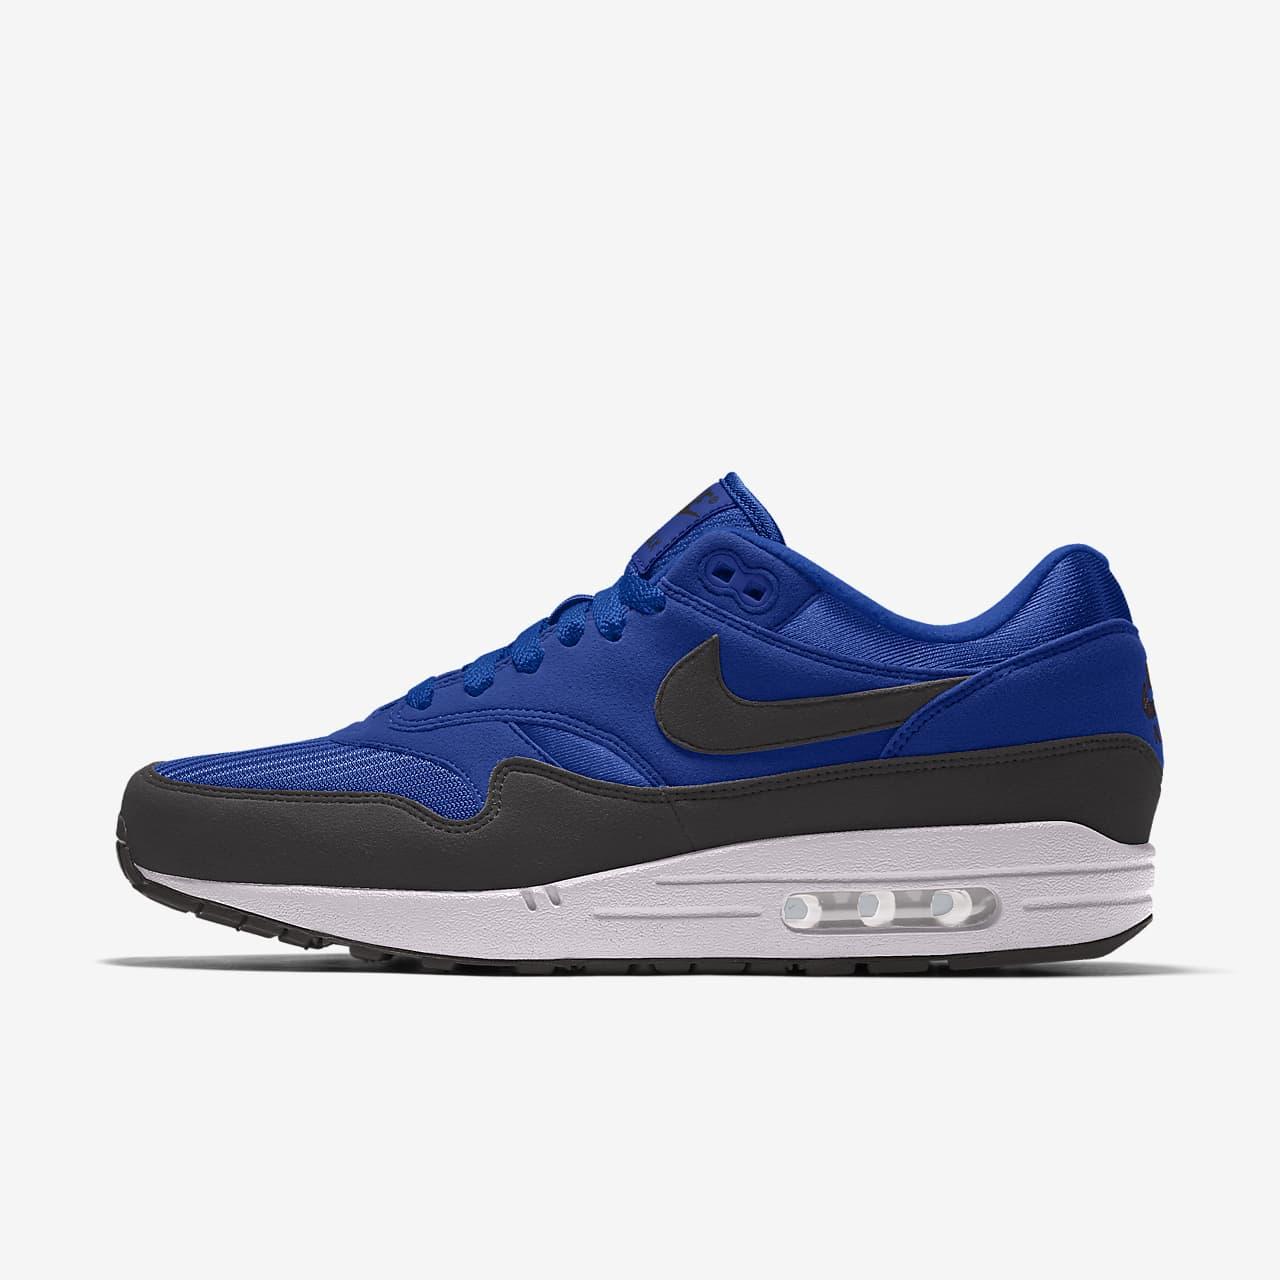 Nike Air Max 1 By You Custom herenschoen